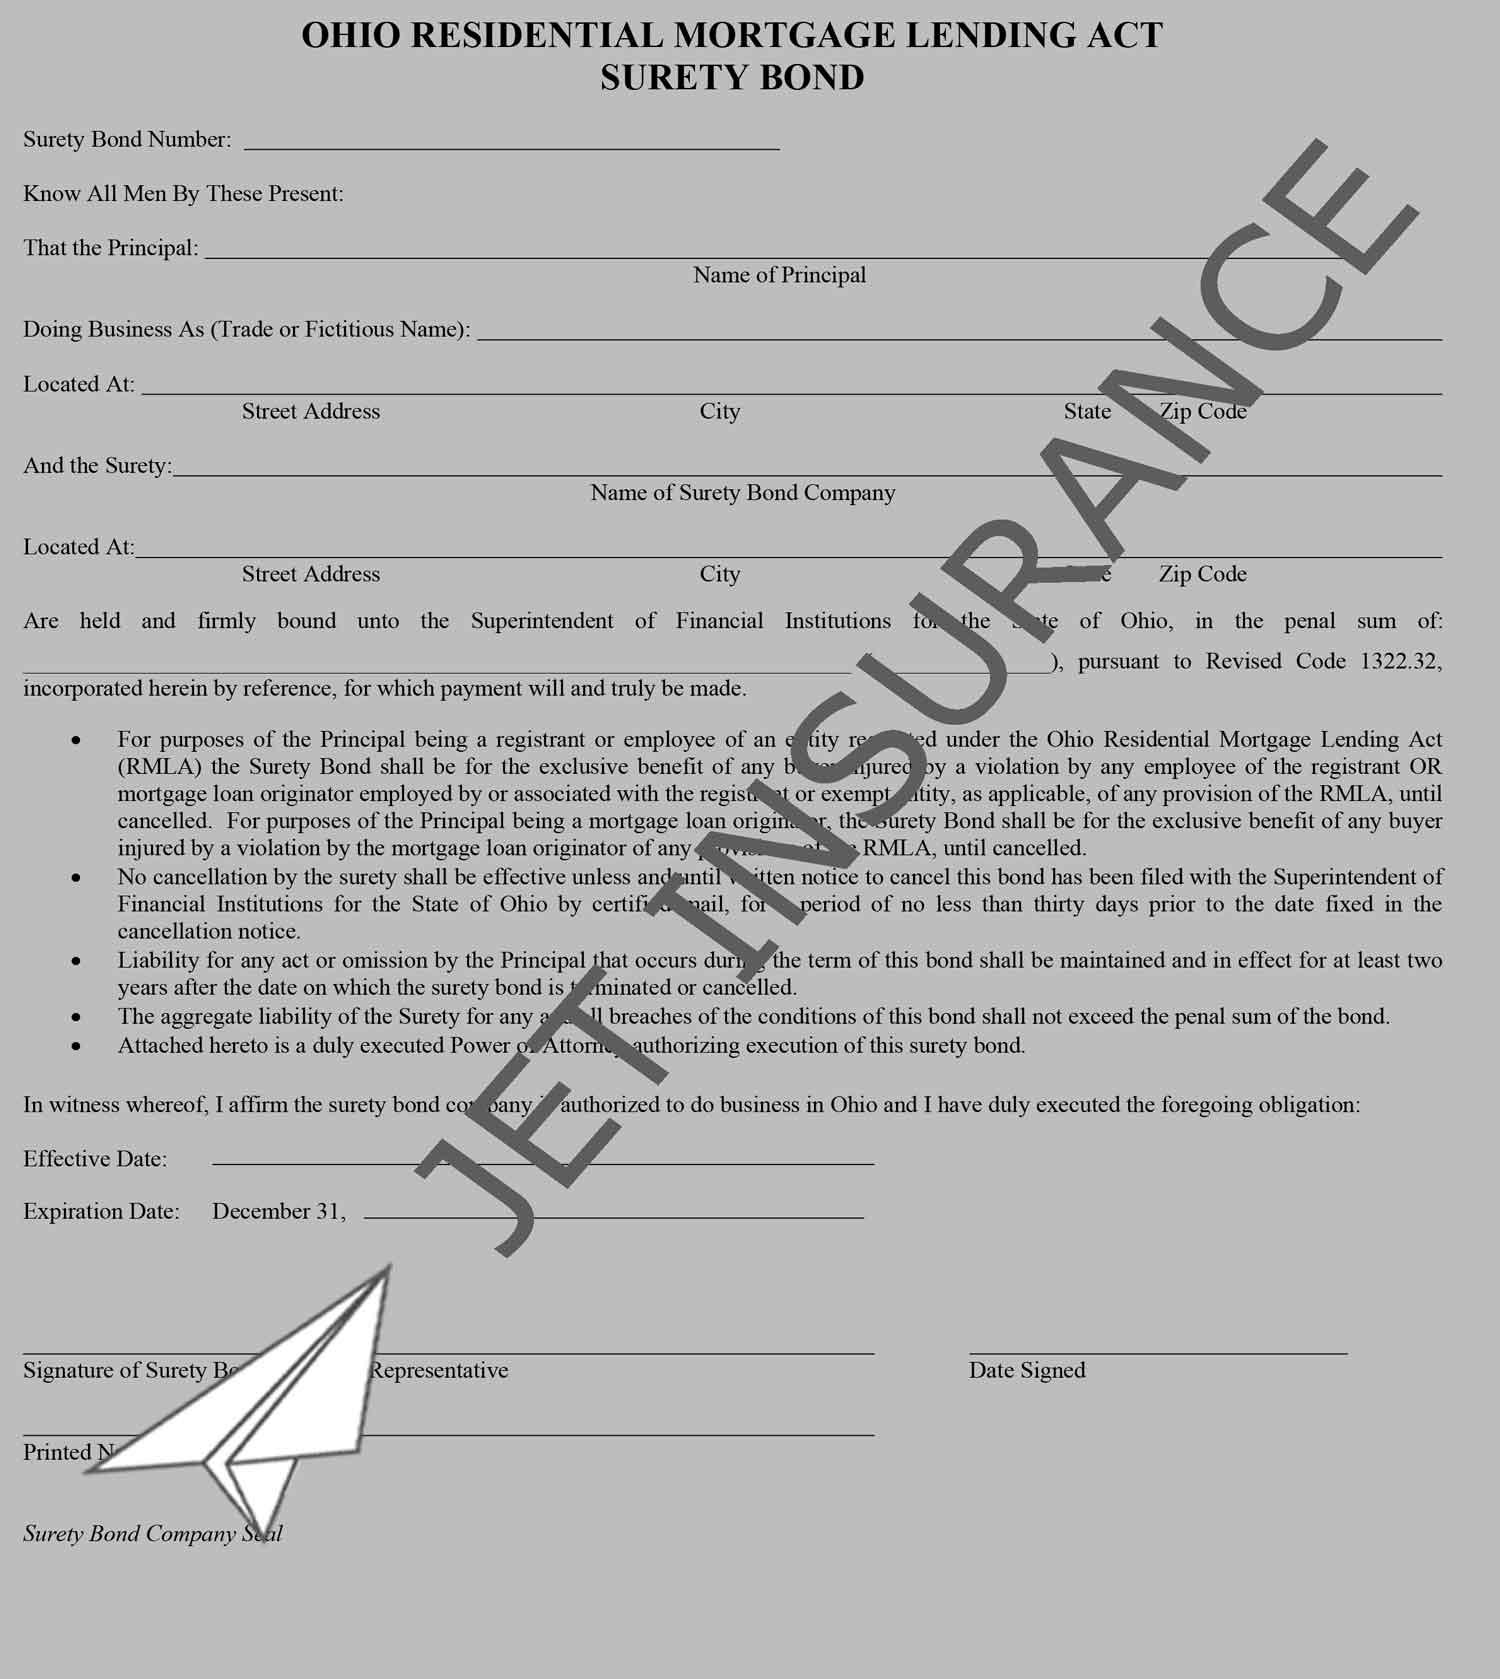 Ohio Residential Mortgage Lending Act Bond Form